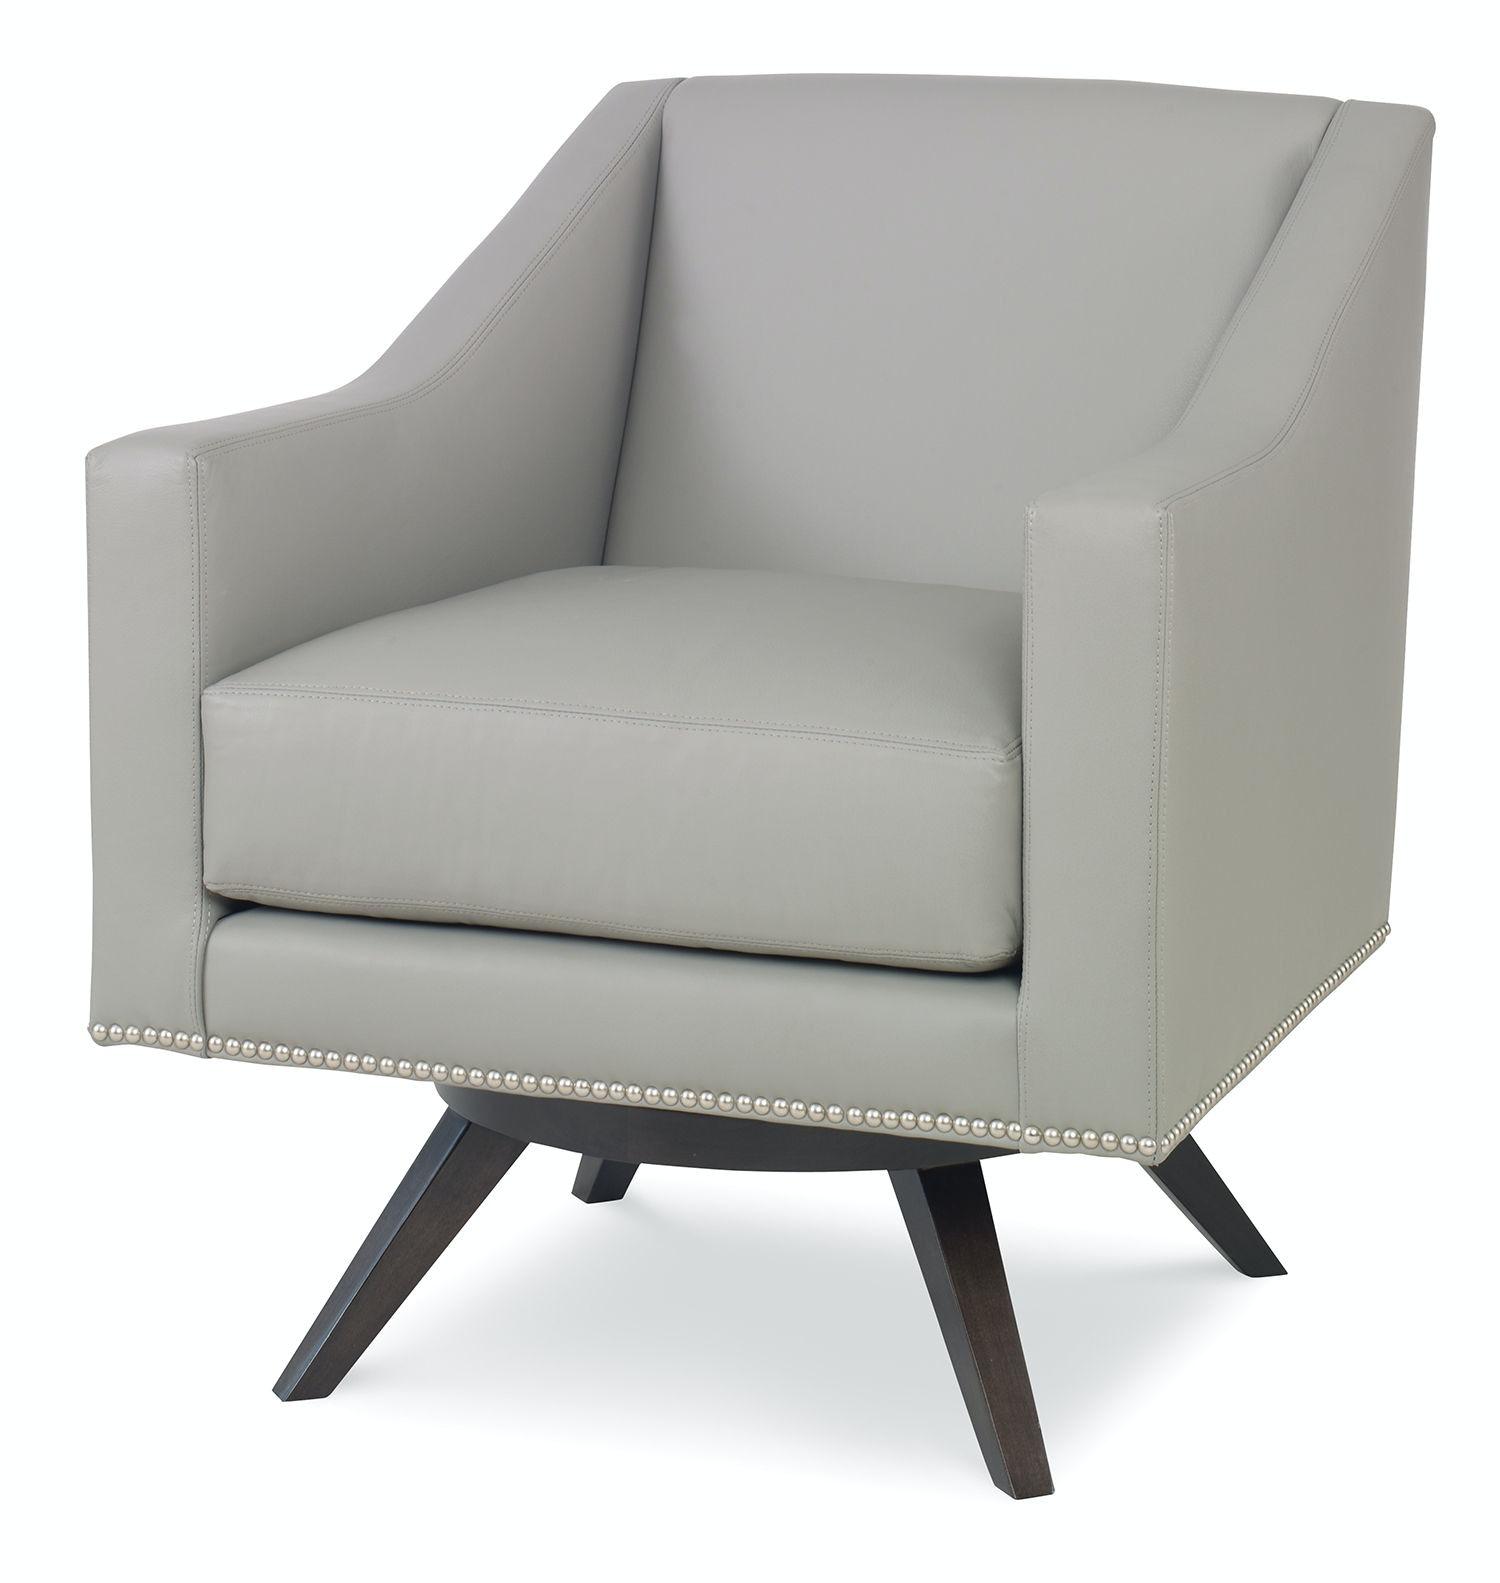 Superior Kravet Smart Albion Swivel Chair DL953 CH